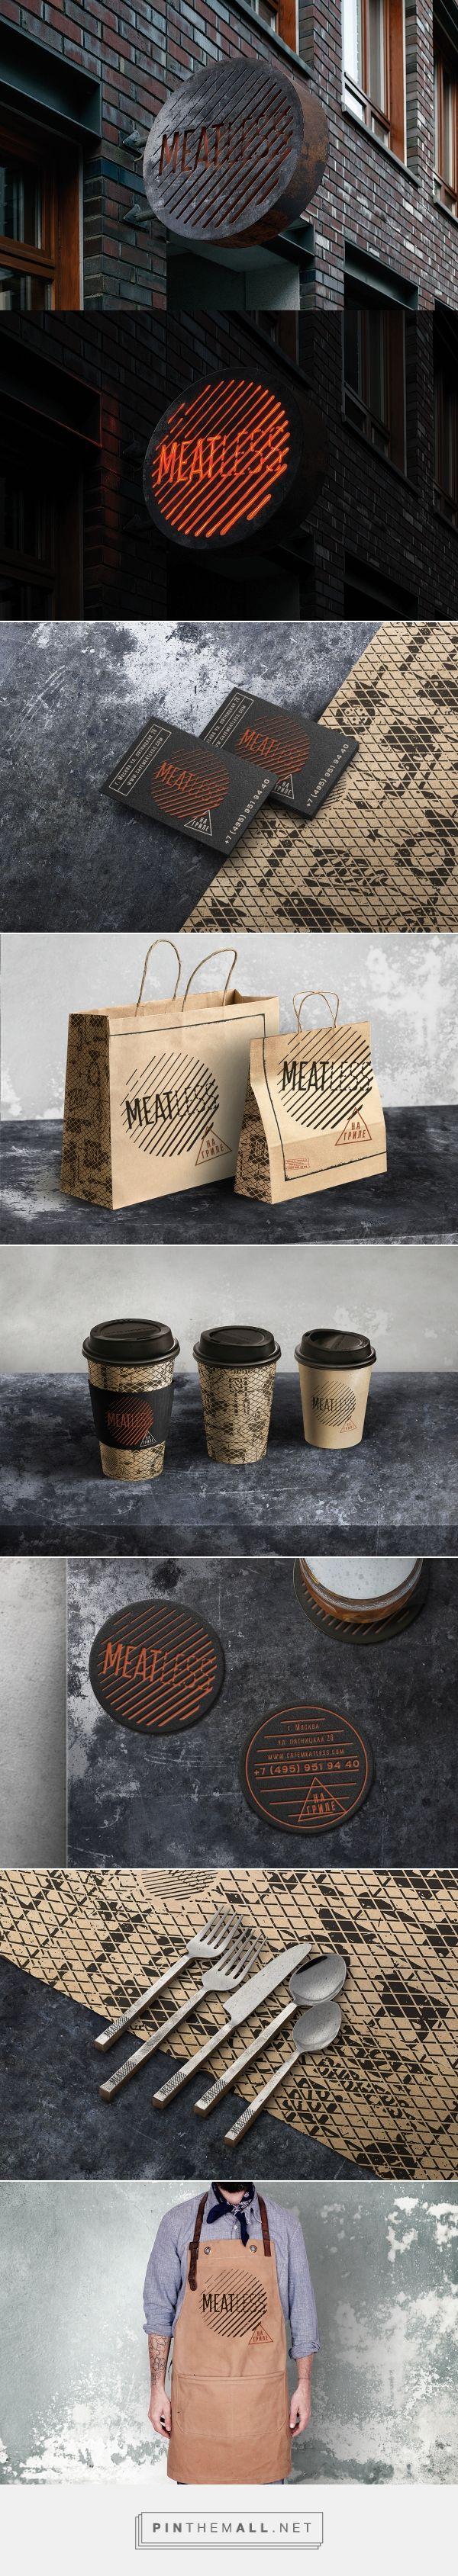 MEATLESS Restaurant Branding by Bureau Bumblebee | Fivestar Branding Agency – Design and Branding Agency & Curated Inspiration Gallery